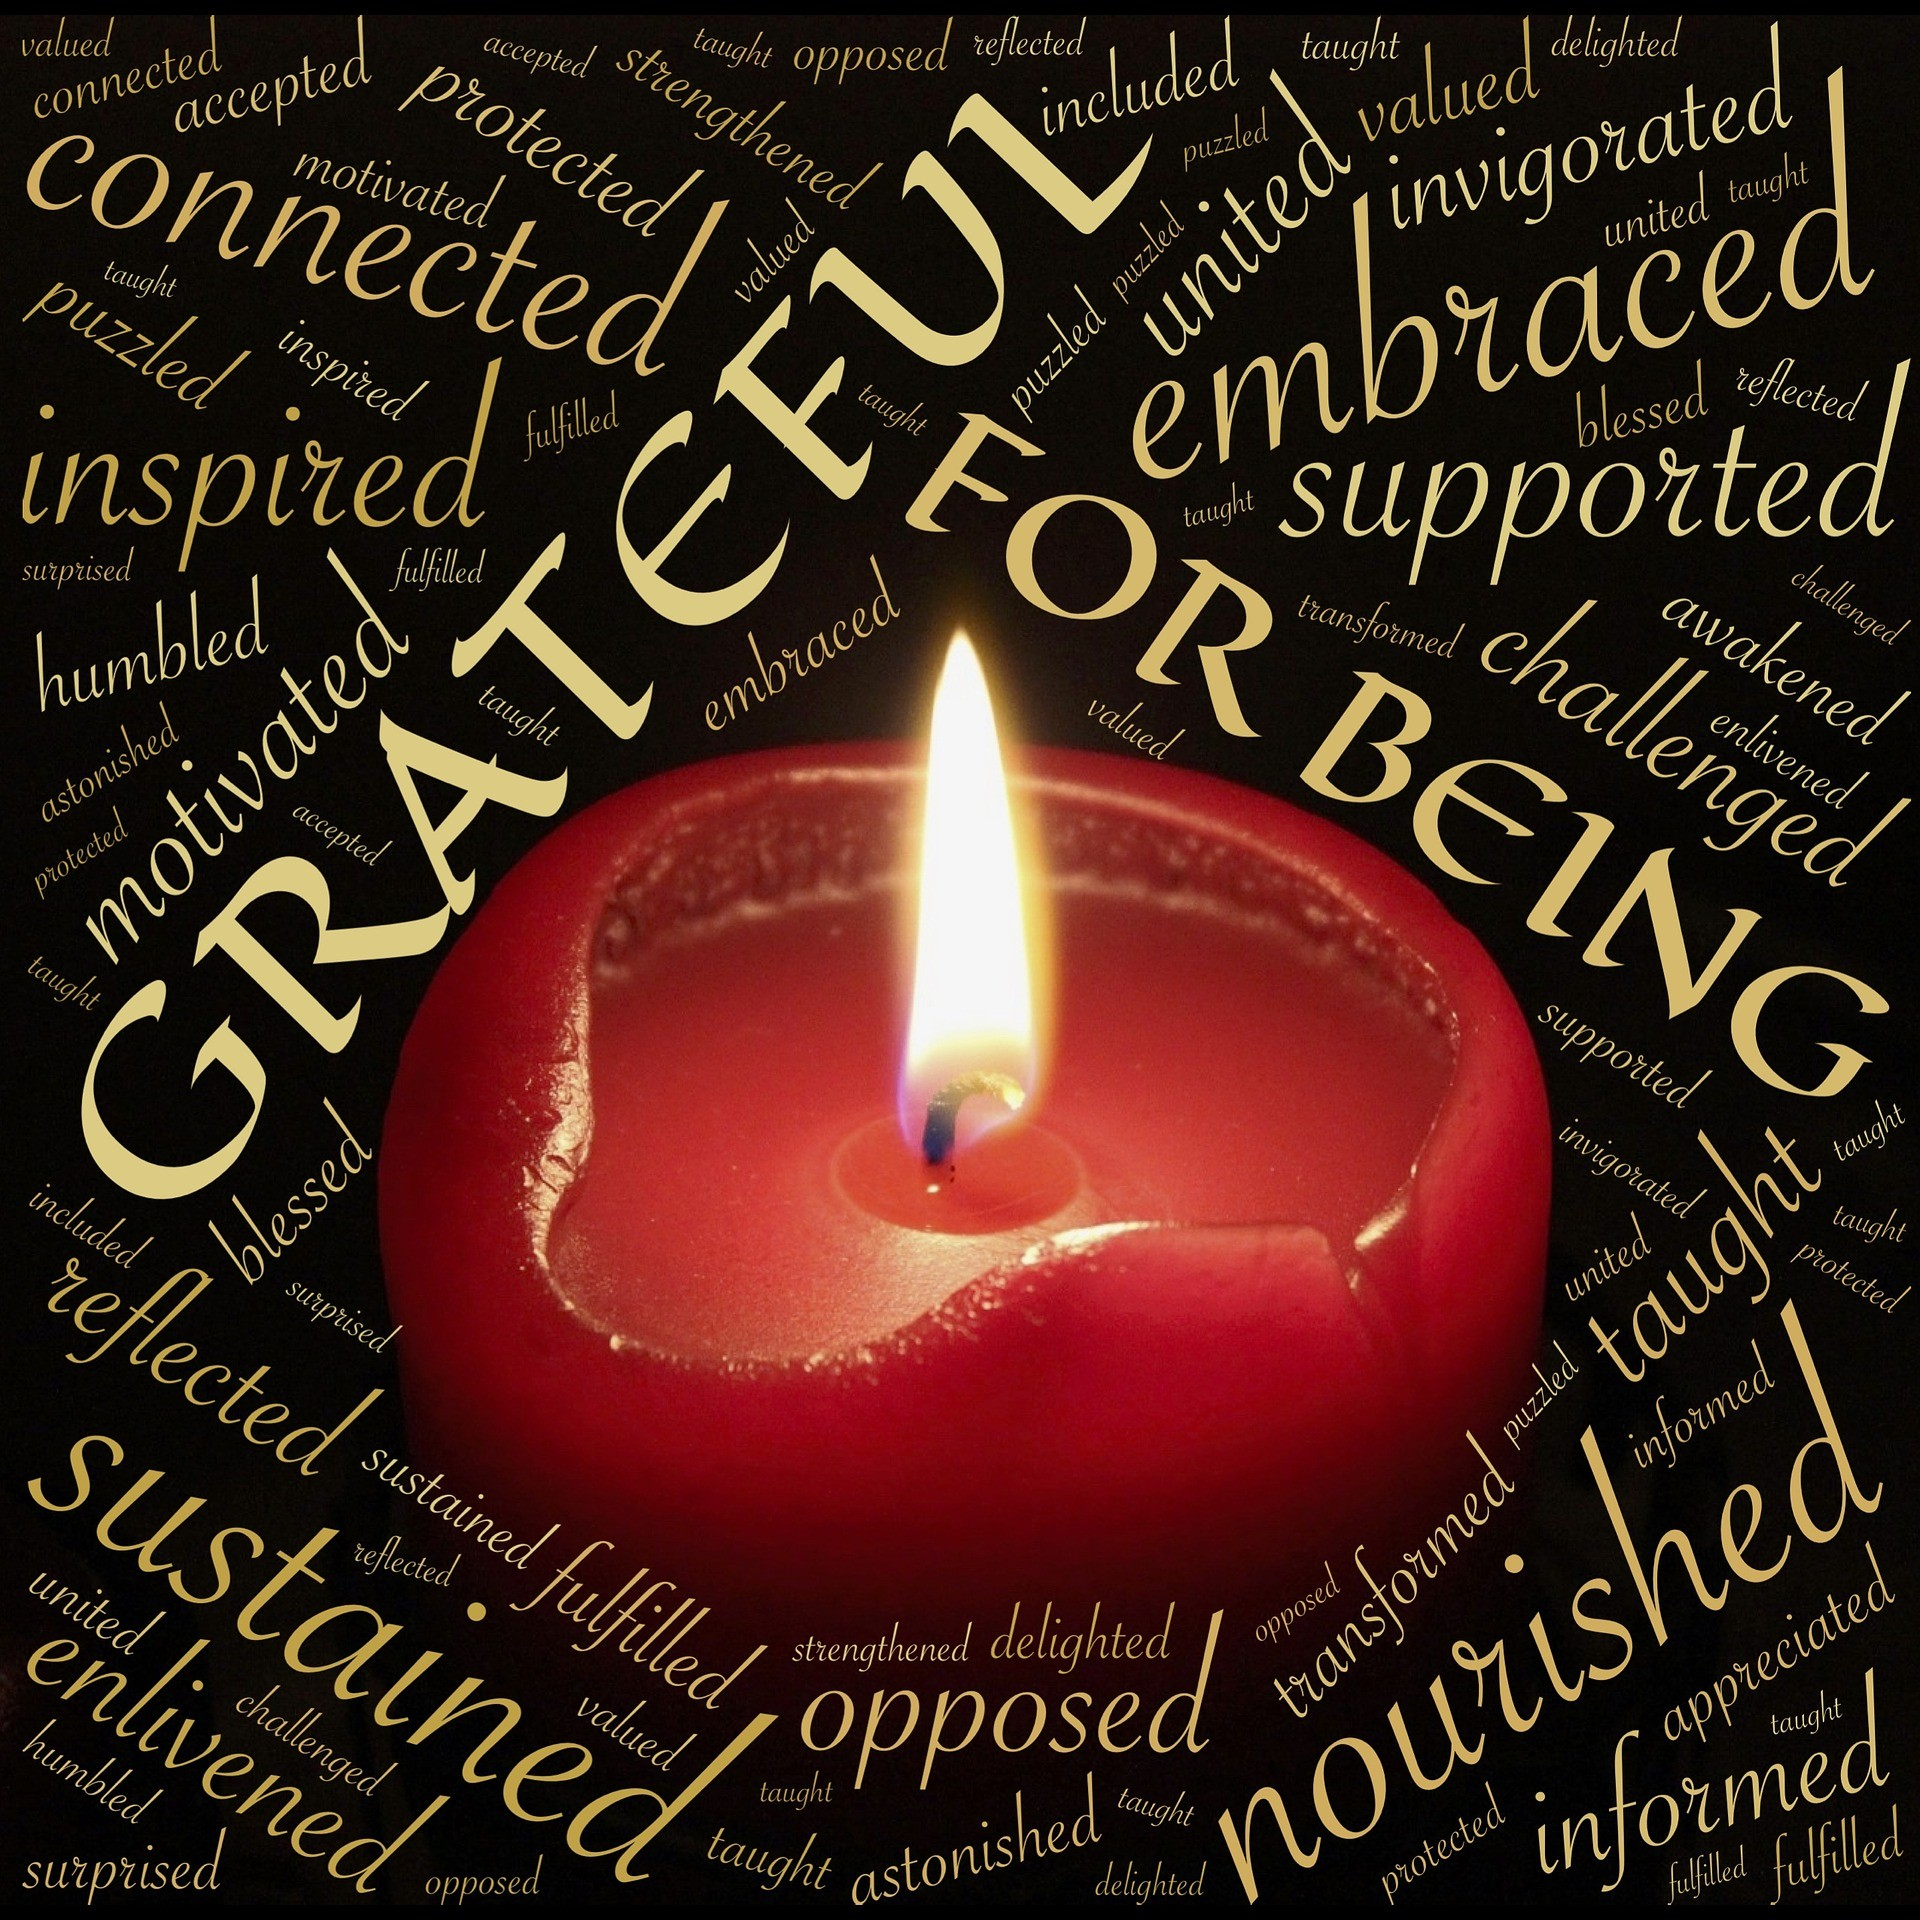 Candle, gratitude